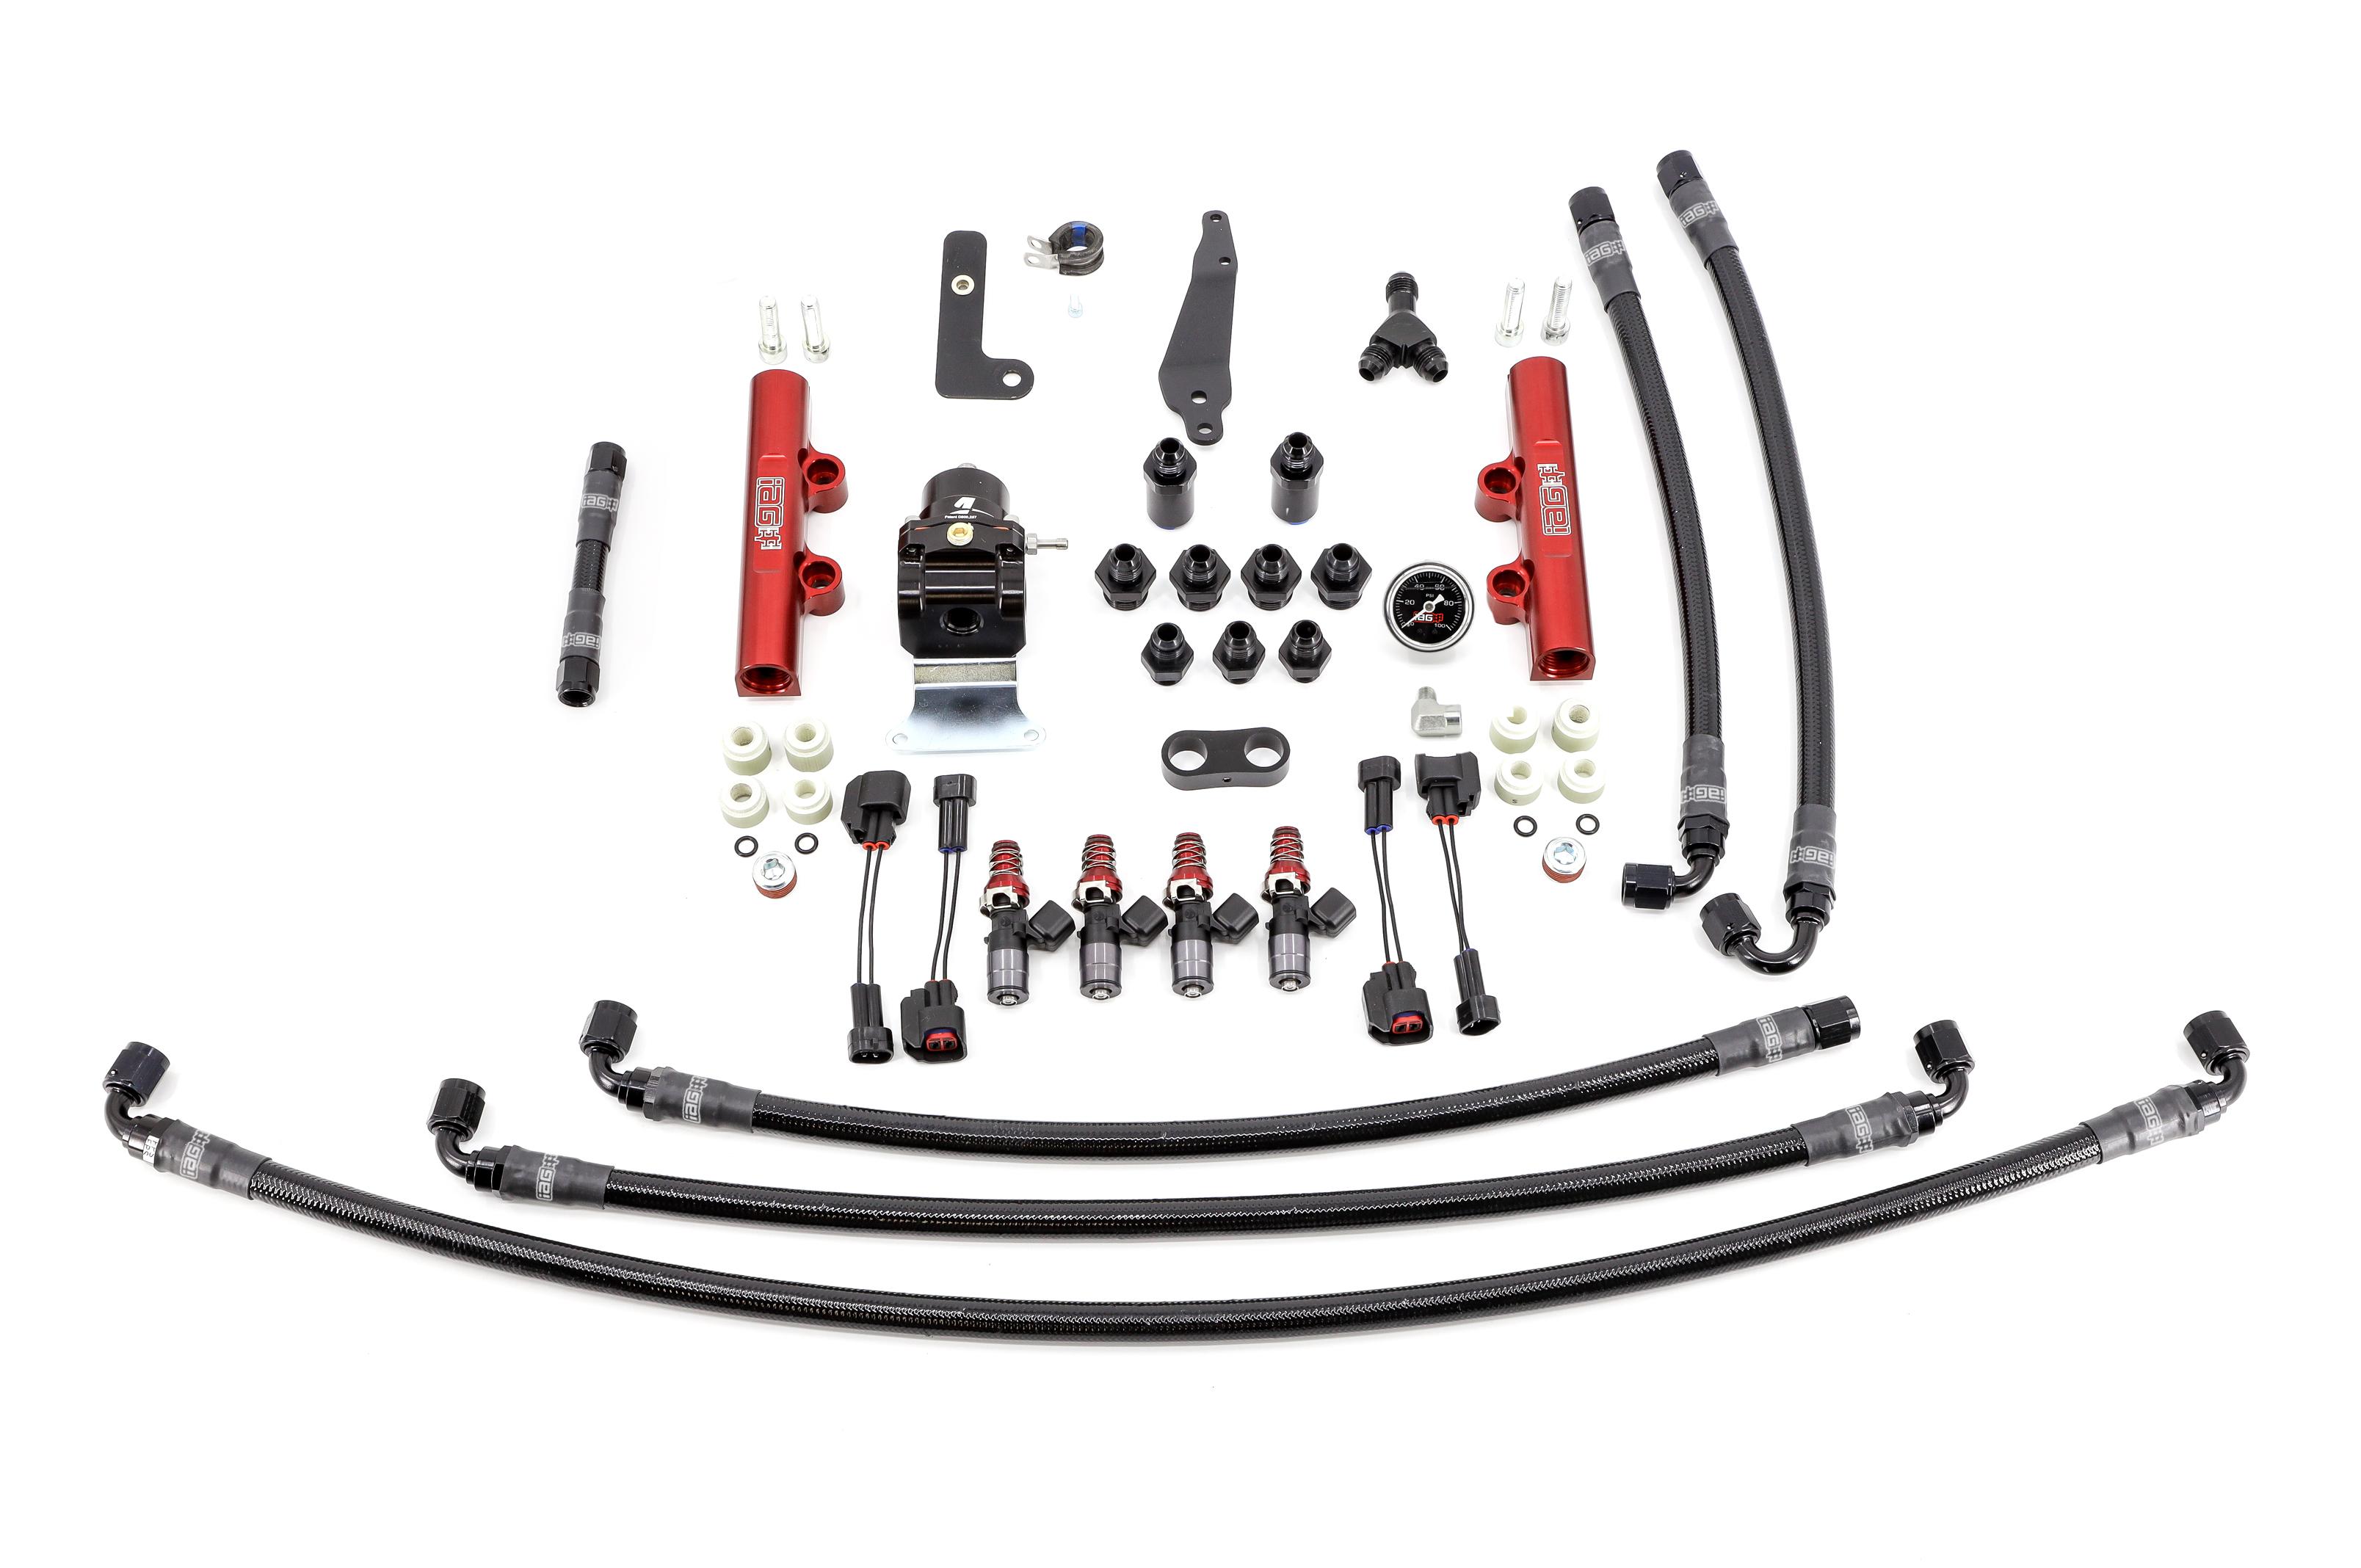 IAG PTFE Flex Fuel System Kit w/ 1300cc Injectors, Lines, FPR, Red Fuel Rails